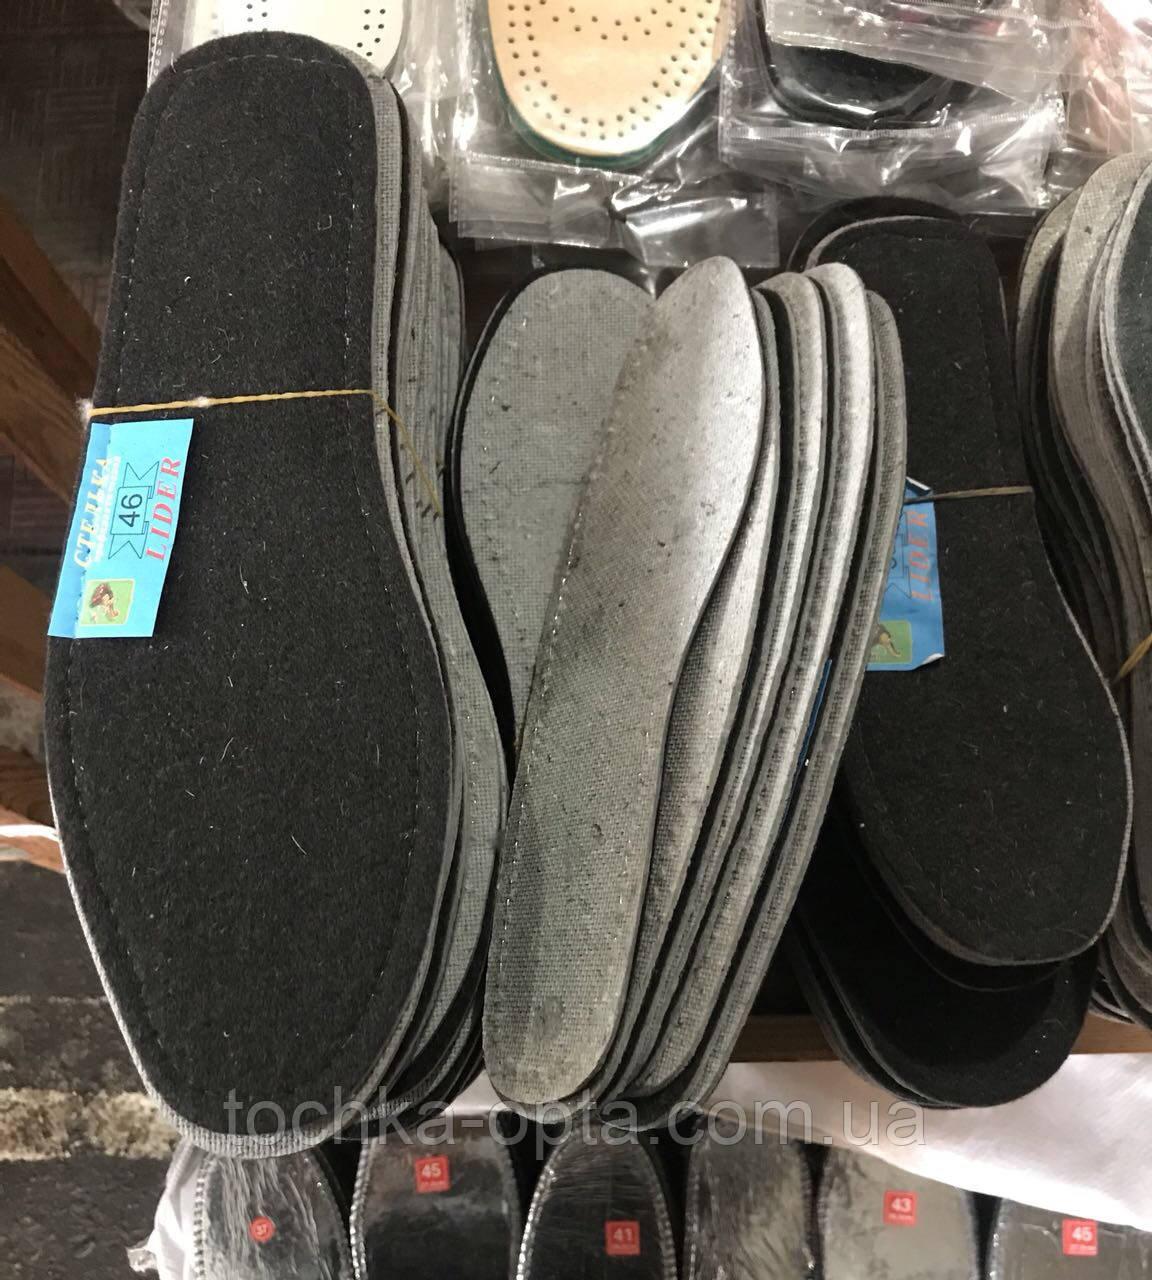 Стелька для обуви байка на кожкартоне 36